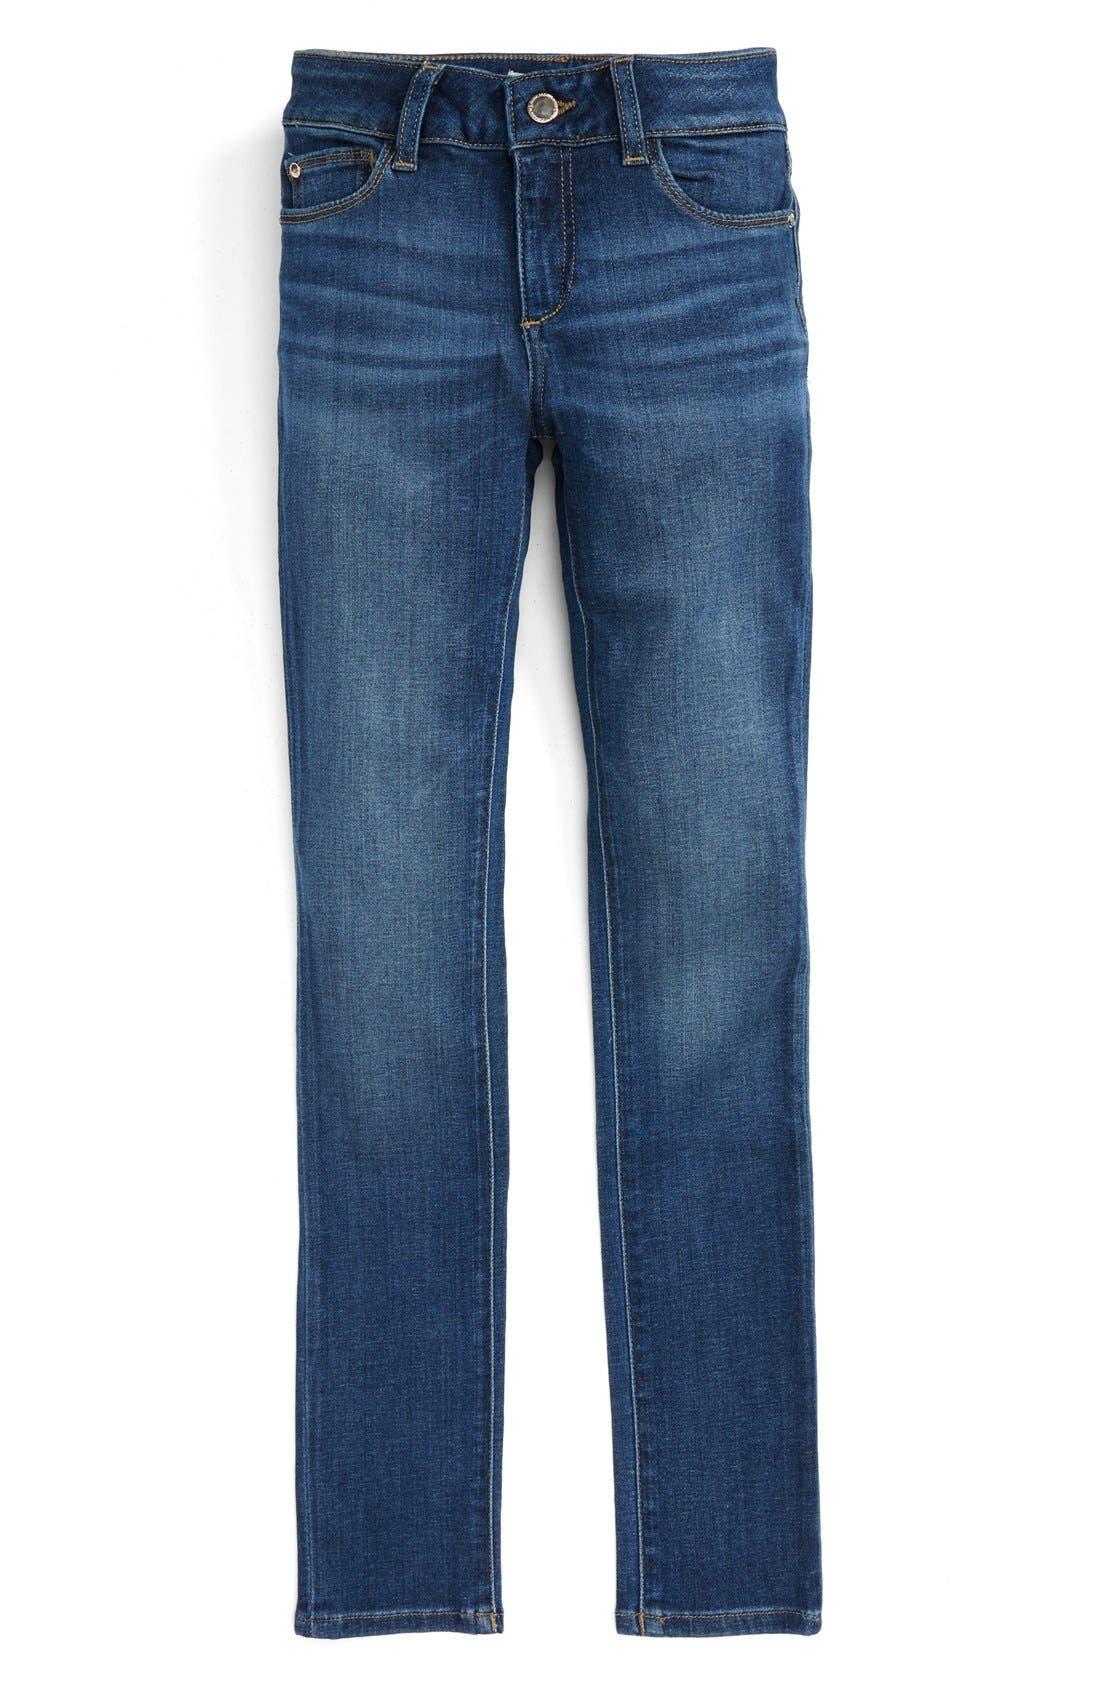 DL1961 Chloe Mid Rise Skinny Jeans, Main, color, PARULA